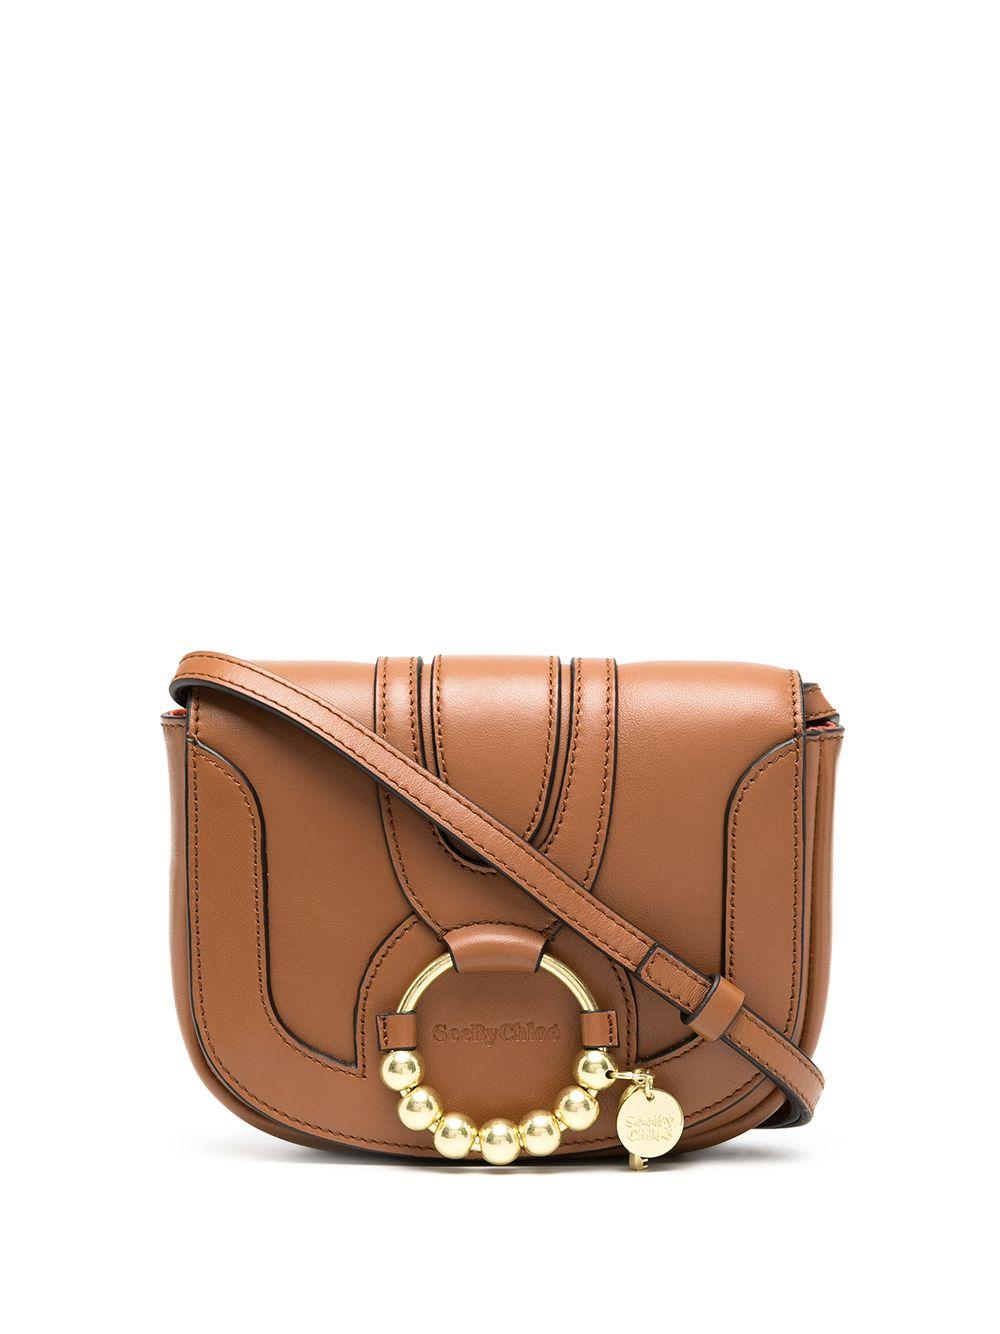 Hana Leather Crossbody Bag